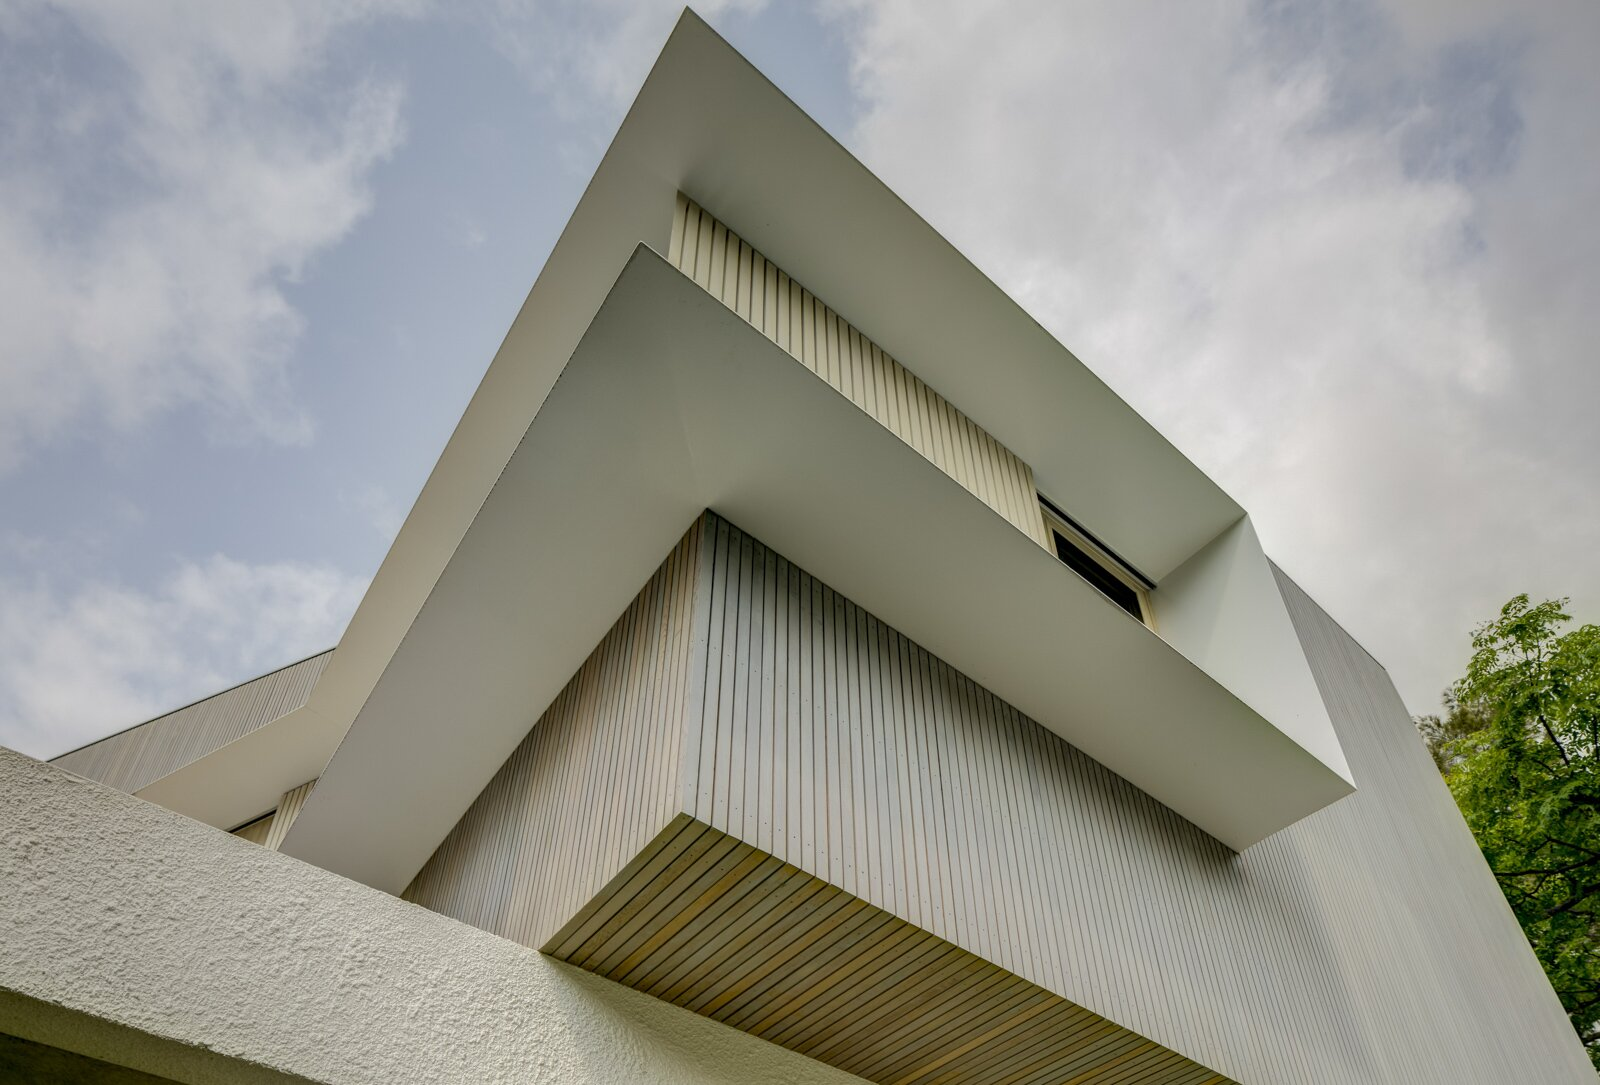 Ballast Point House by Fox Johnston